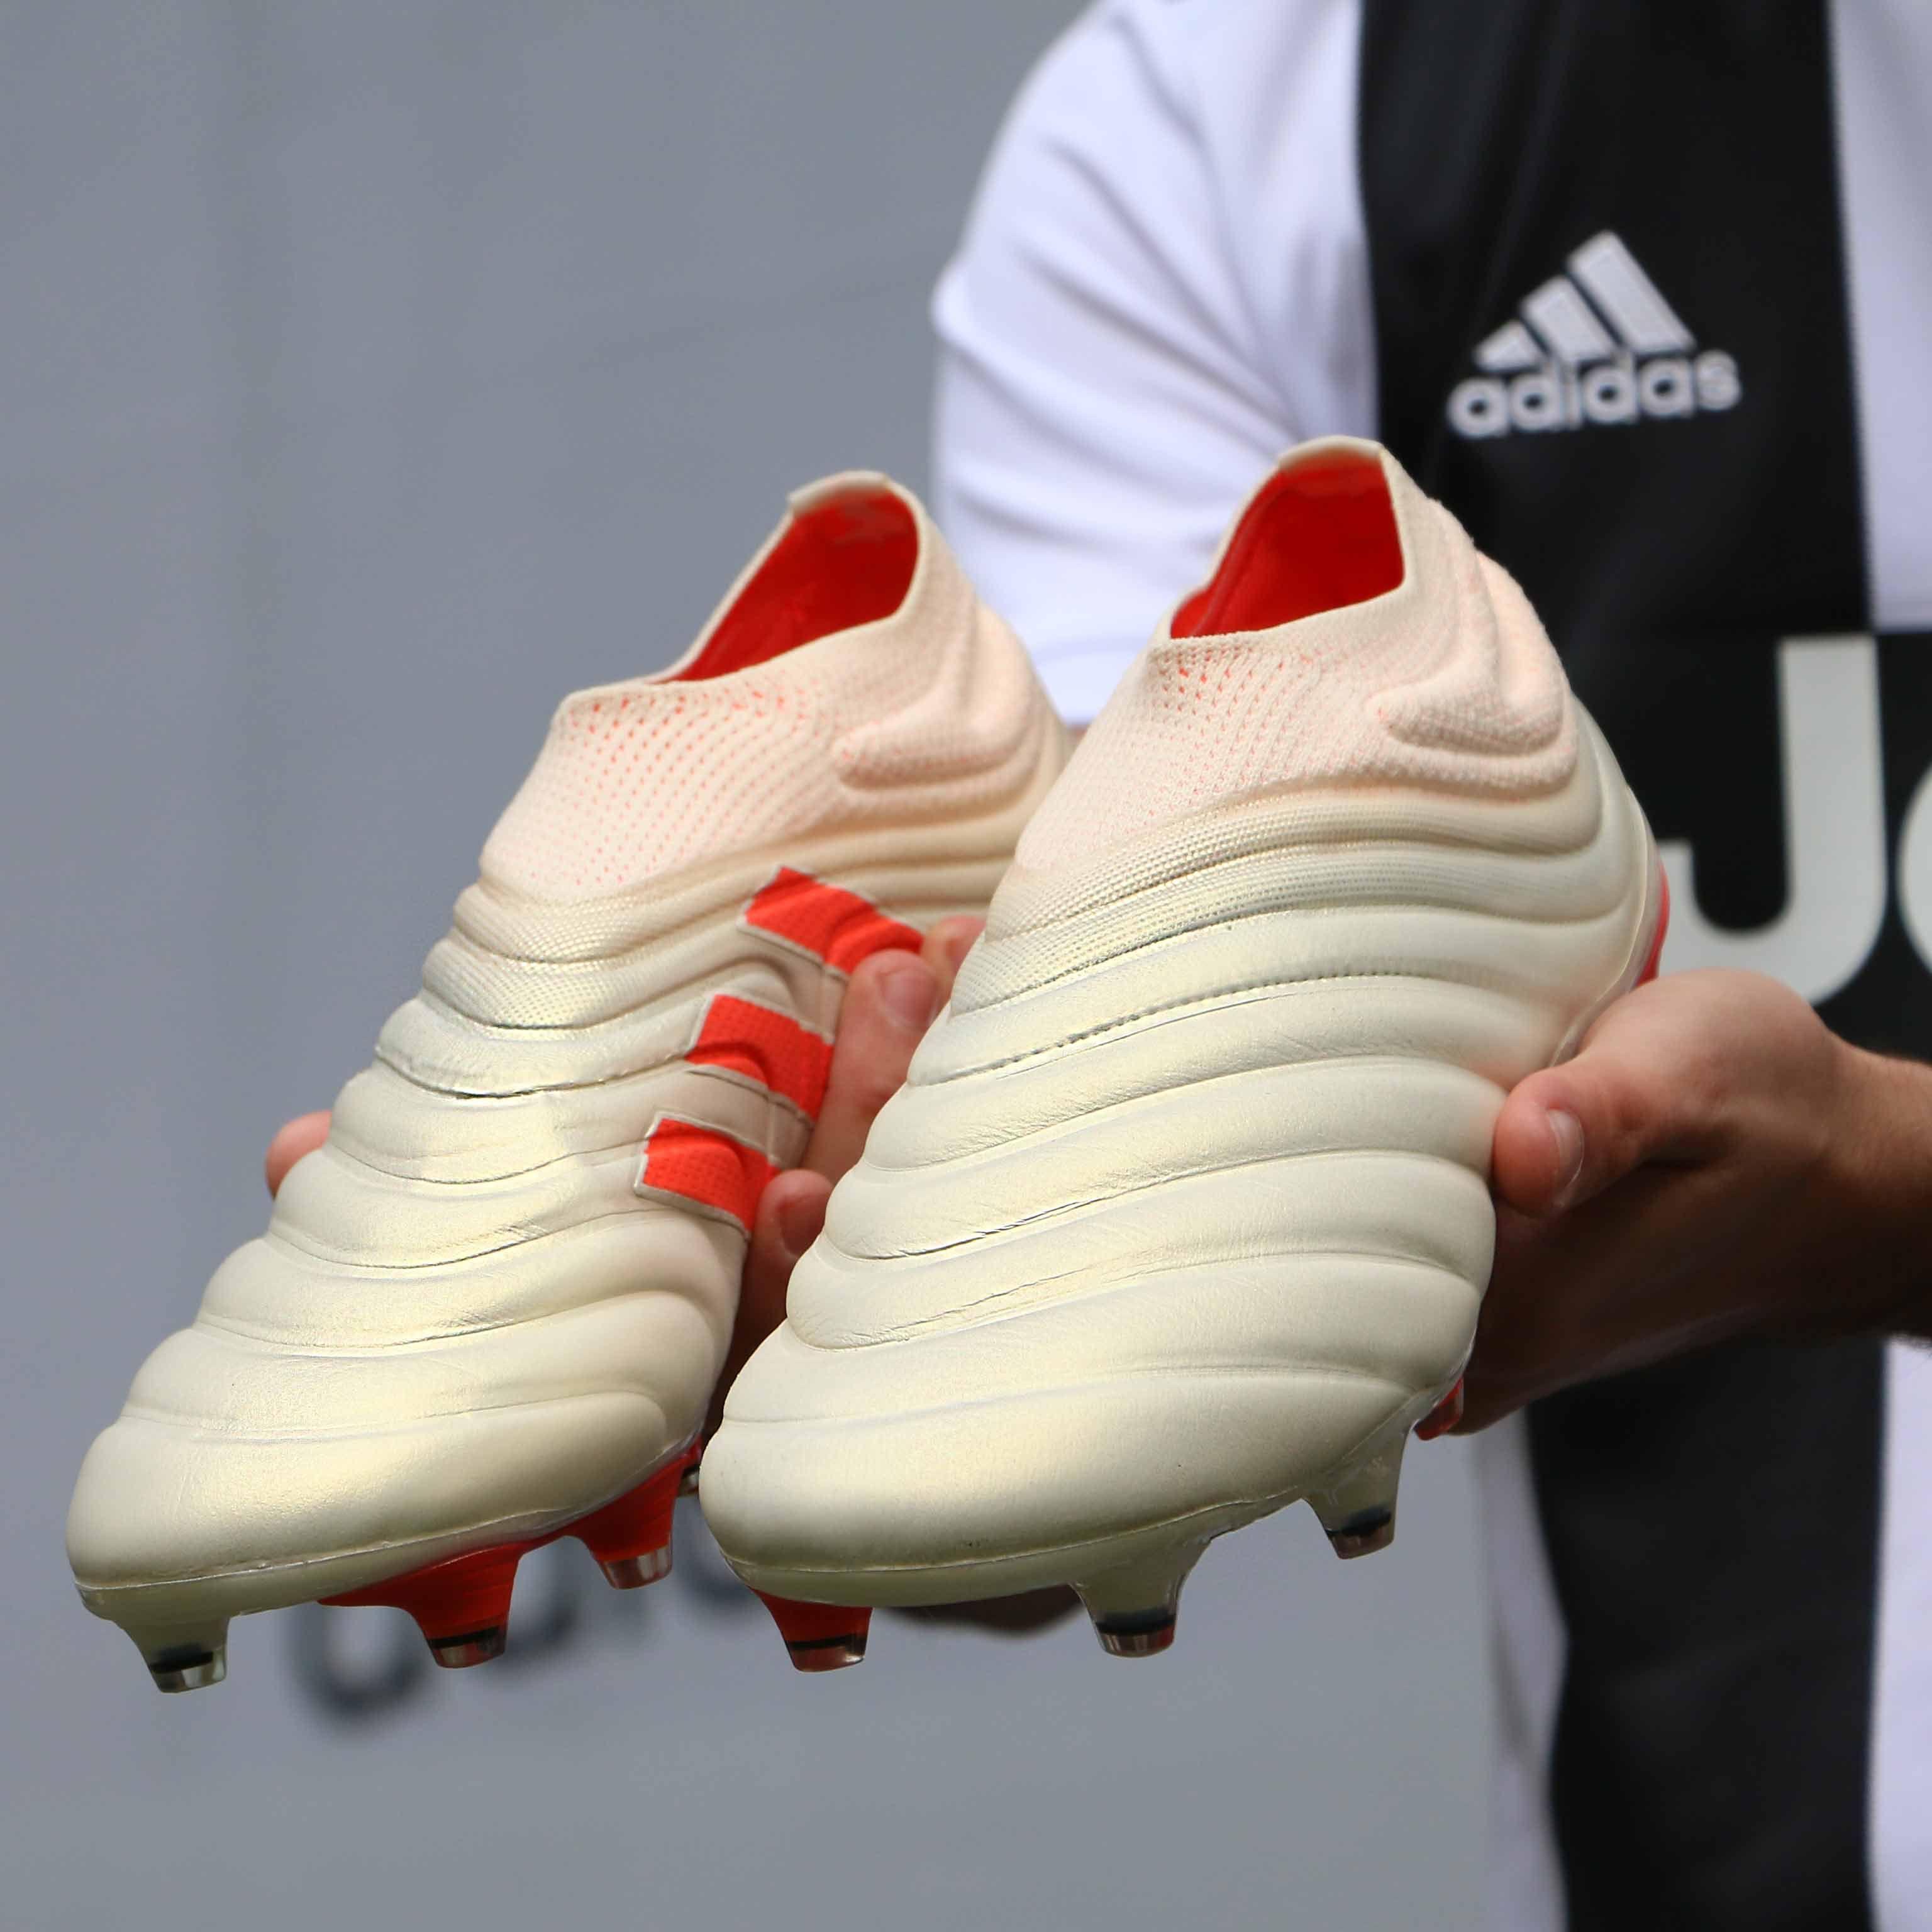 adidas Copa | Botas adidas, Zapatos de futbol adidas, Adidas